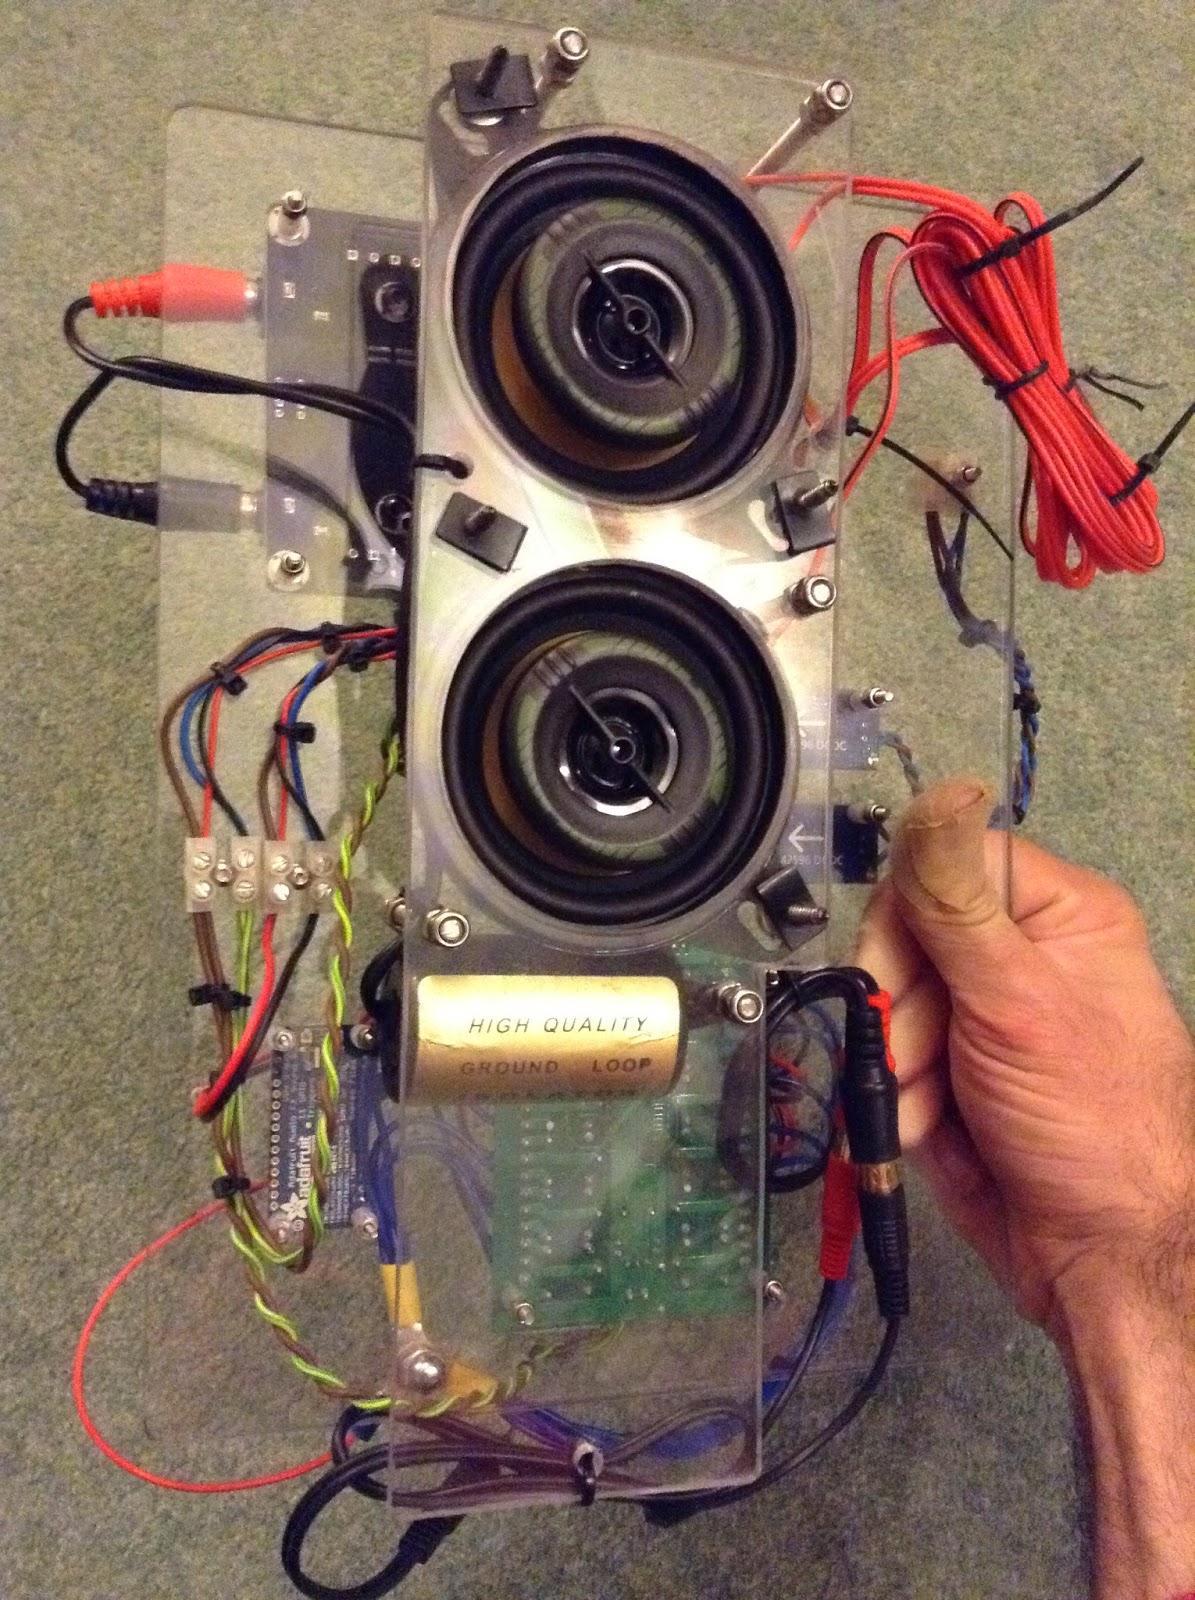 R5-D4 sound system